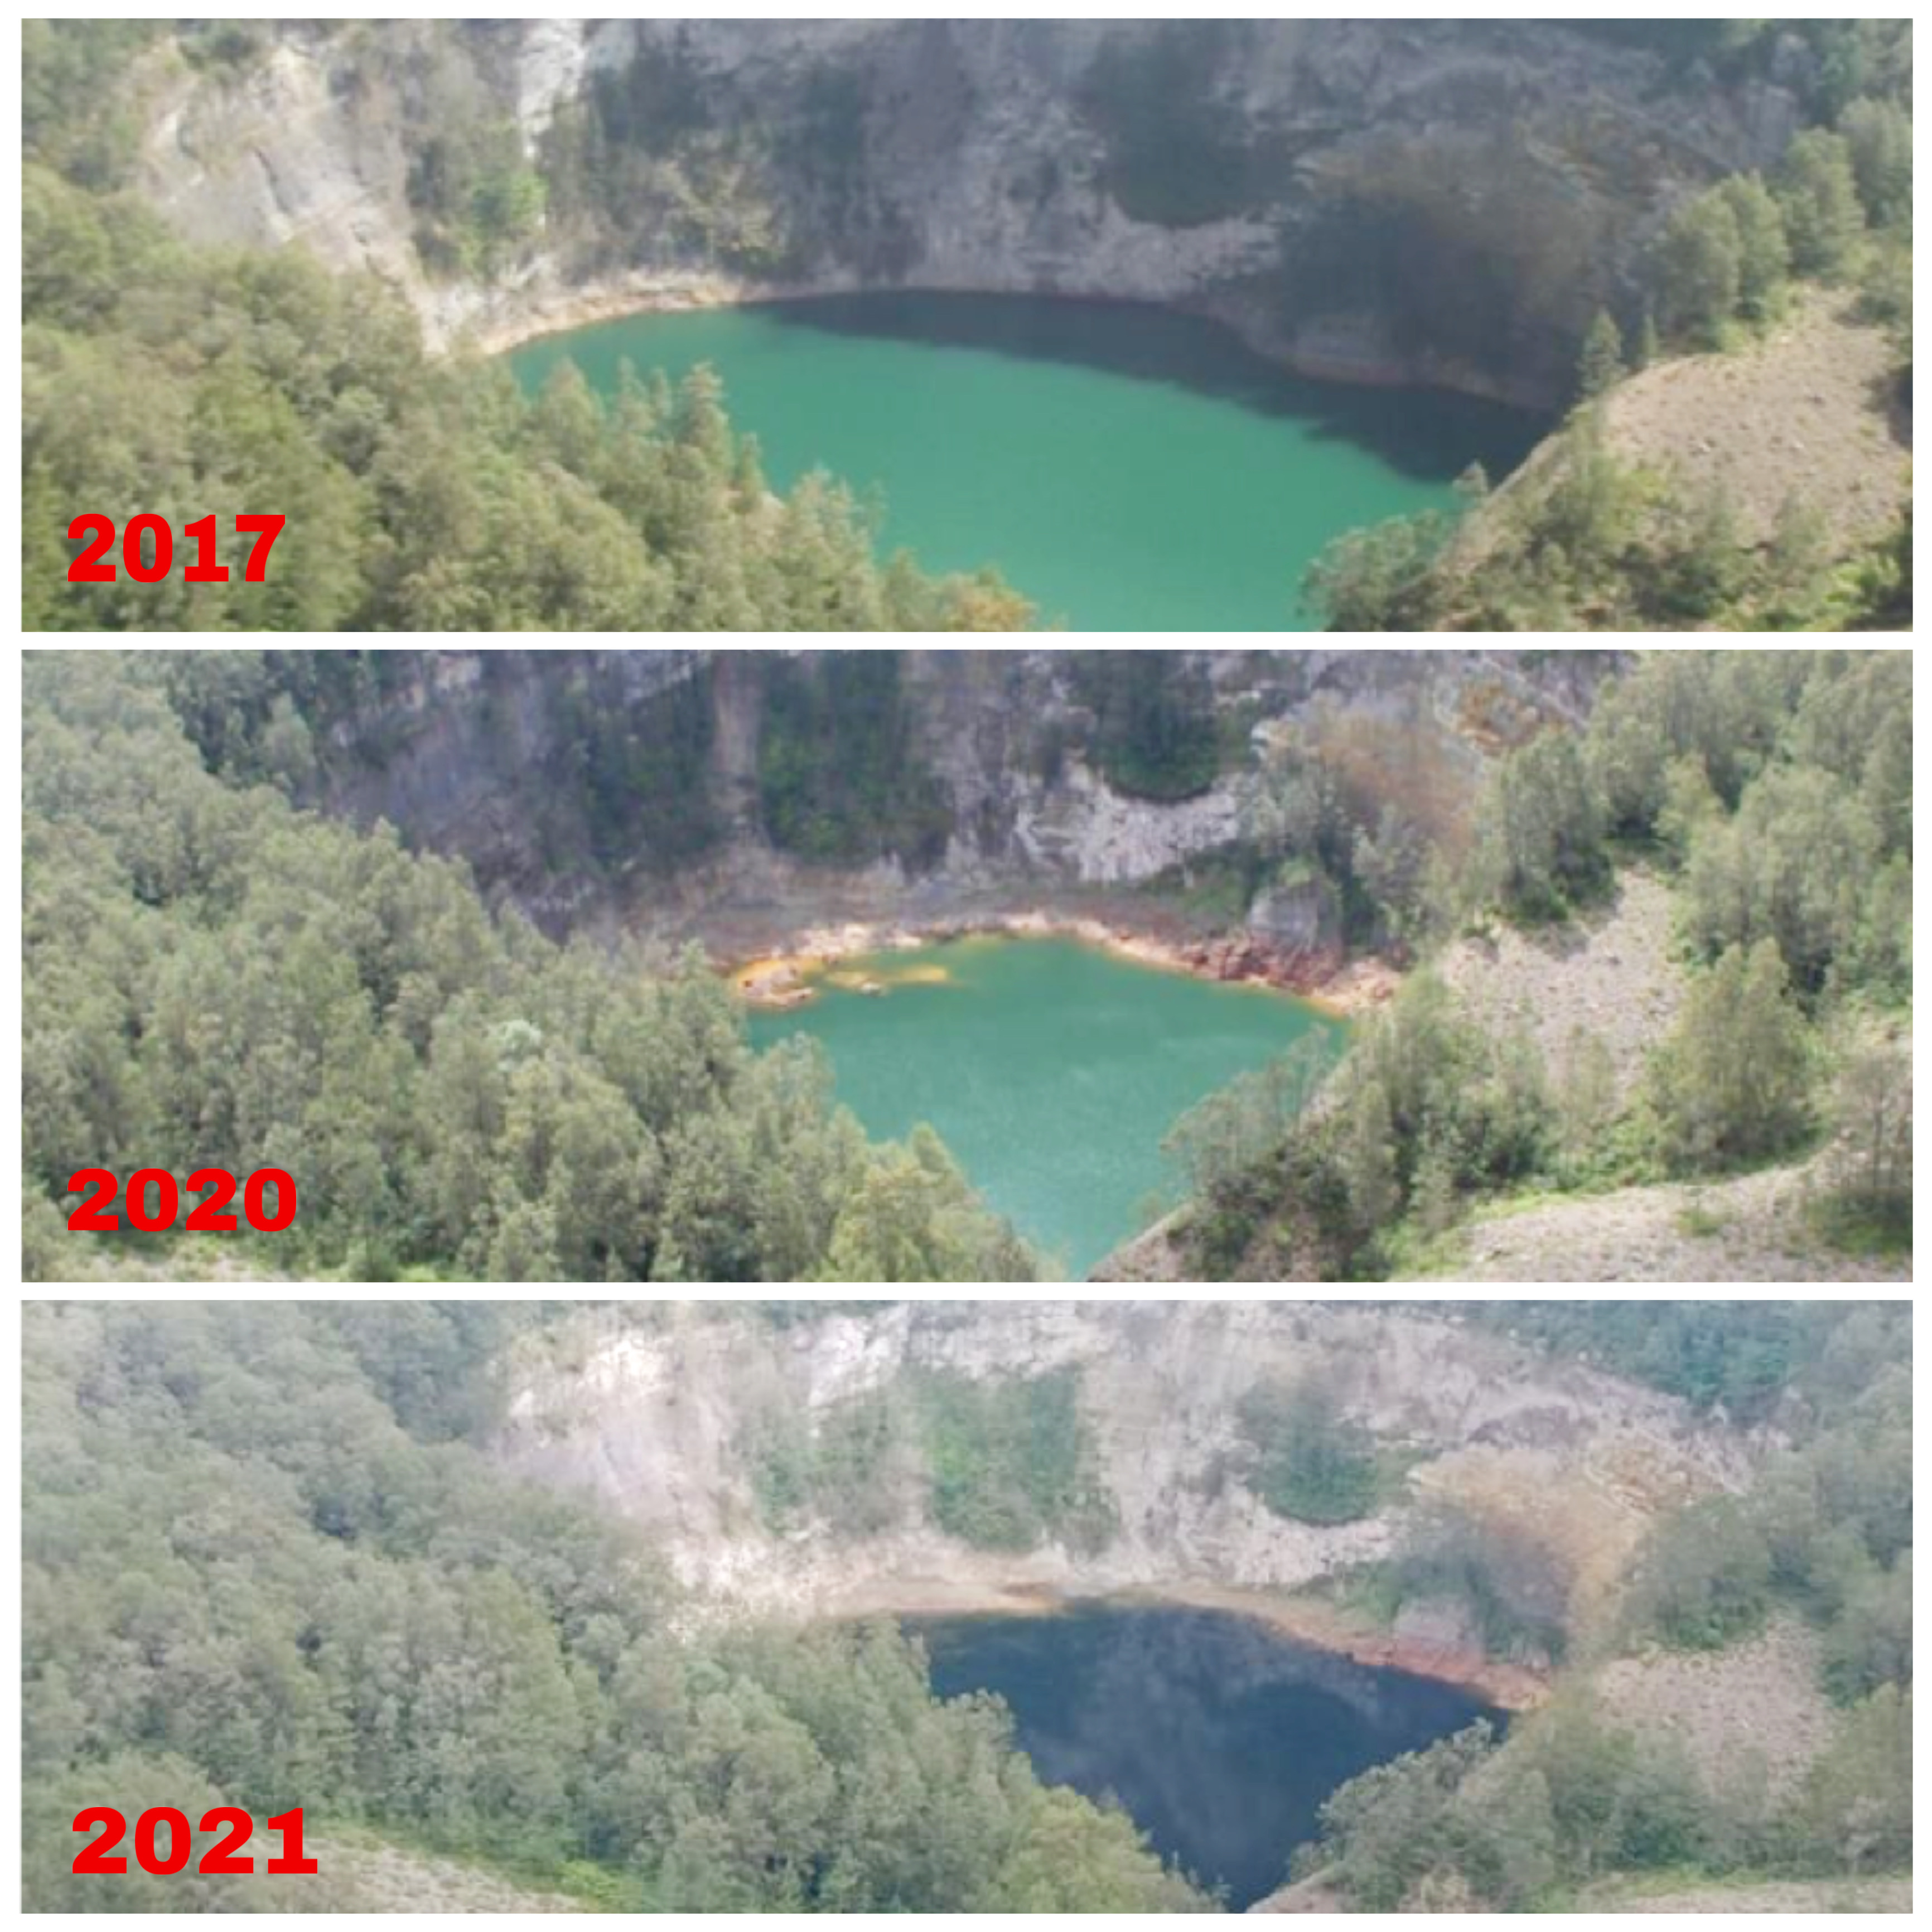 Kembali Naiknya Permukaan Air Danau Ata Mbupu Taman Nasional Kelimutu